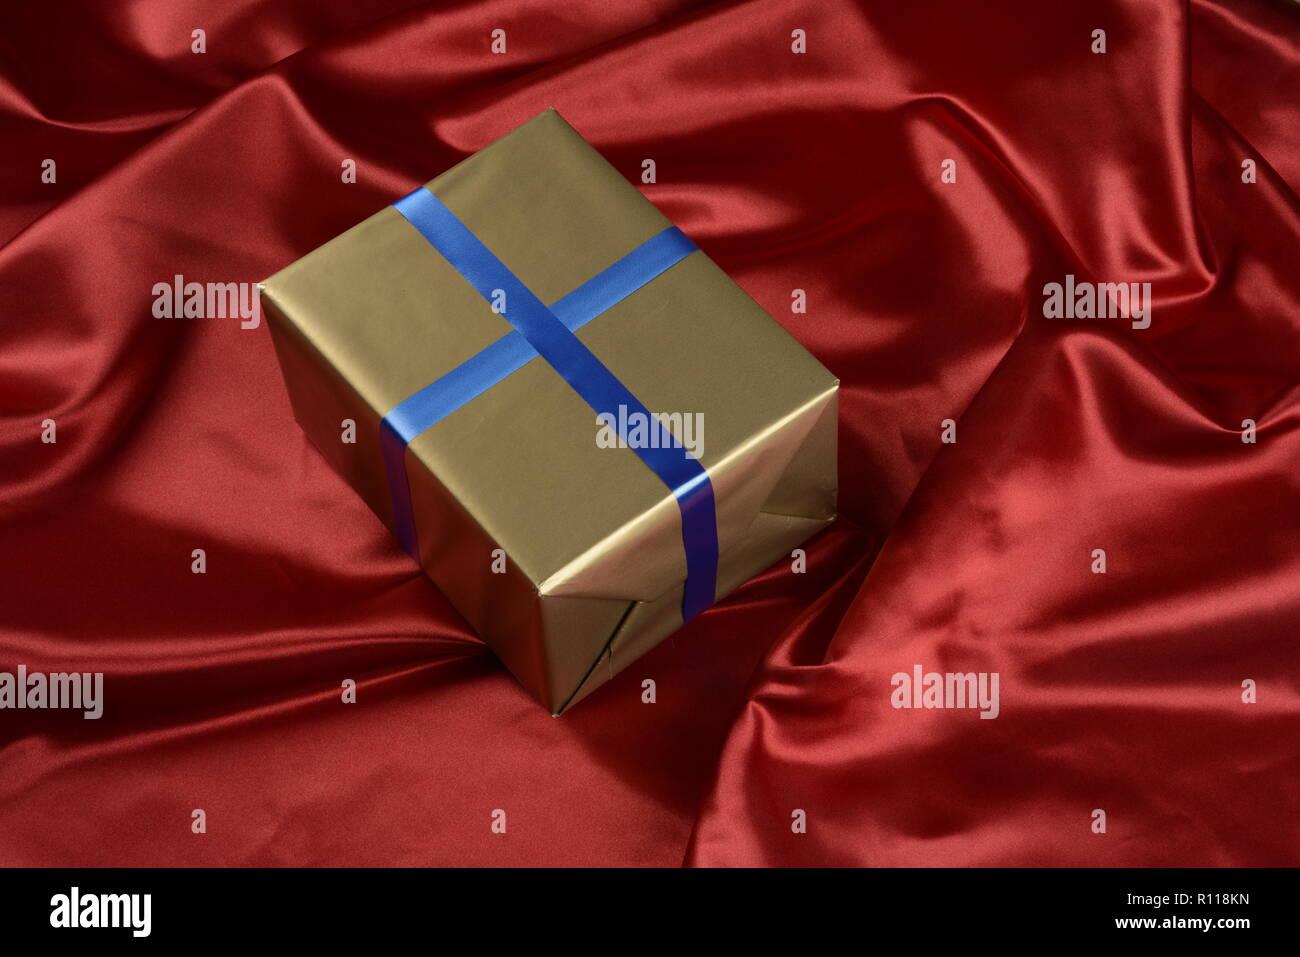 Caja de regalo de color dorado sobre fondo de tela de color rojo Imagen De Stock